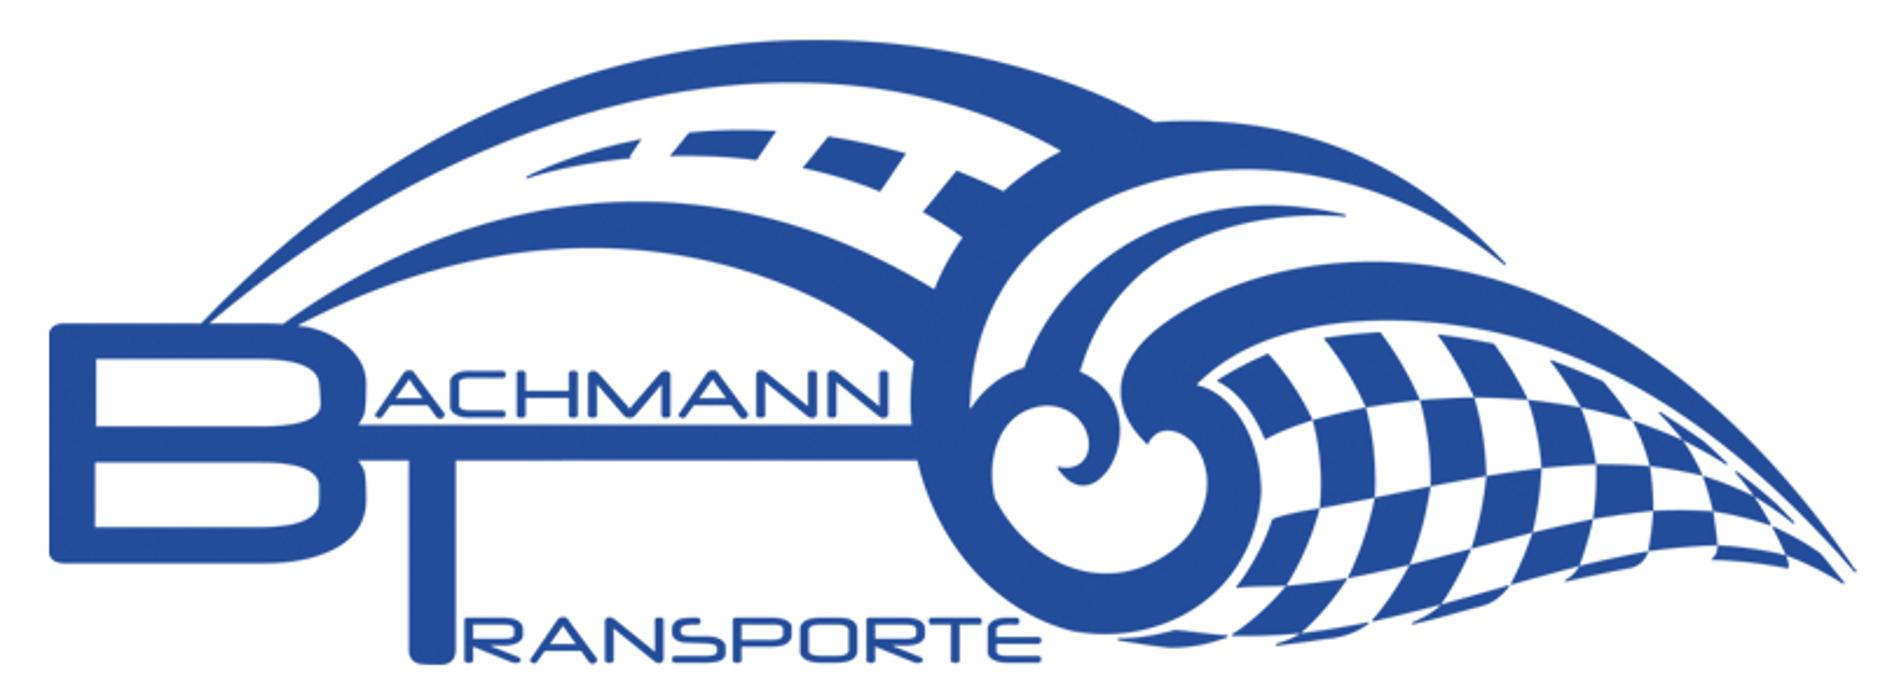 Bild zu Bachmann Transporte, Inh. André Bachmann in Sömmerda